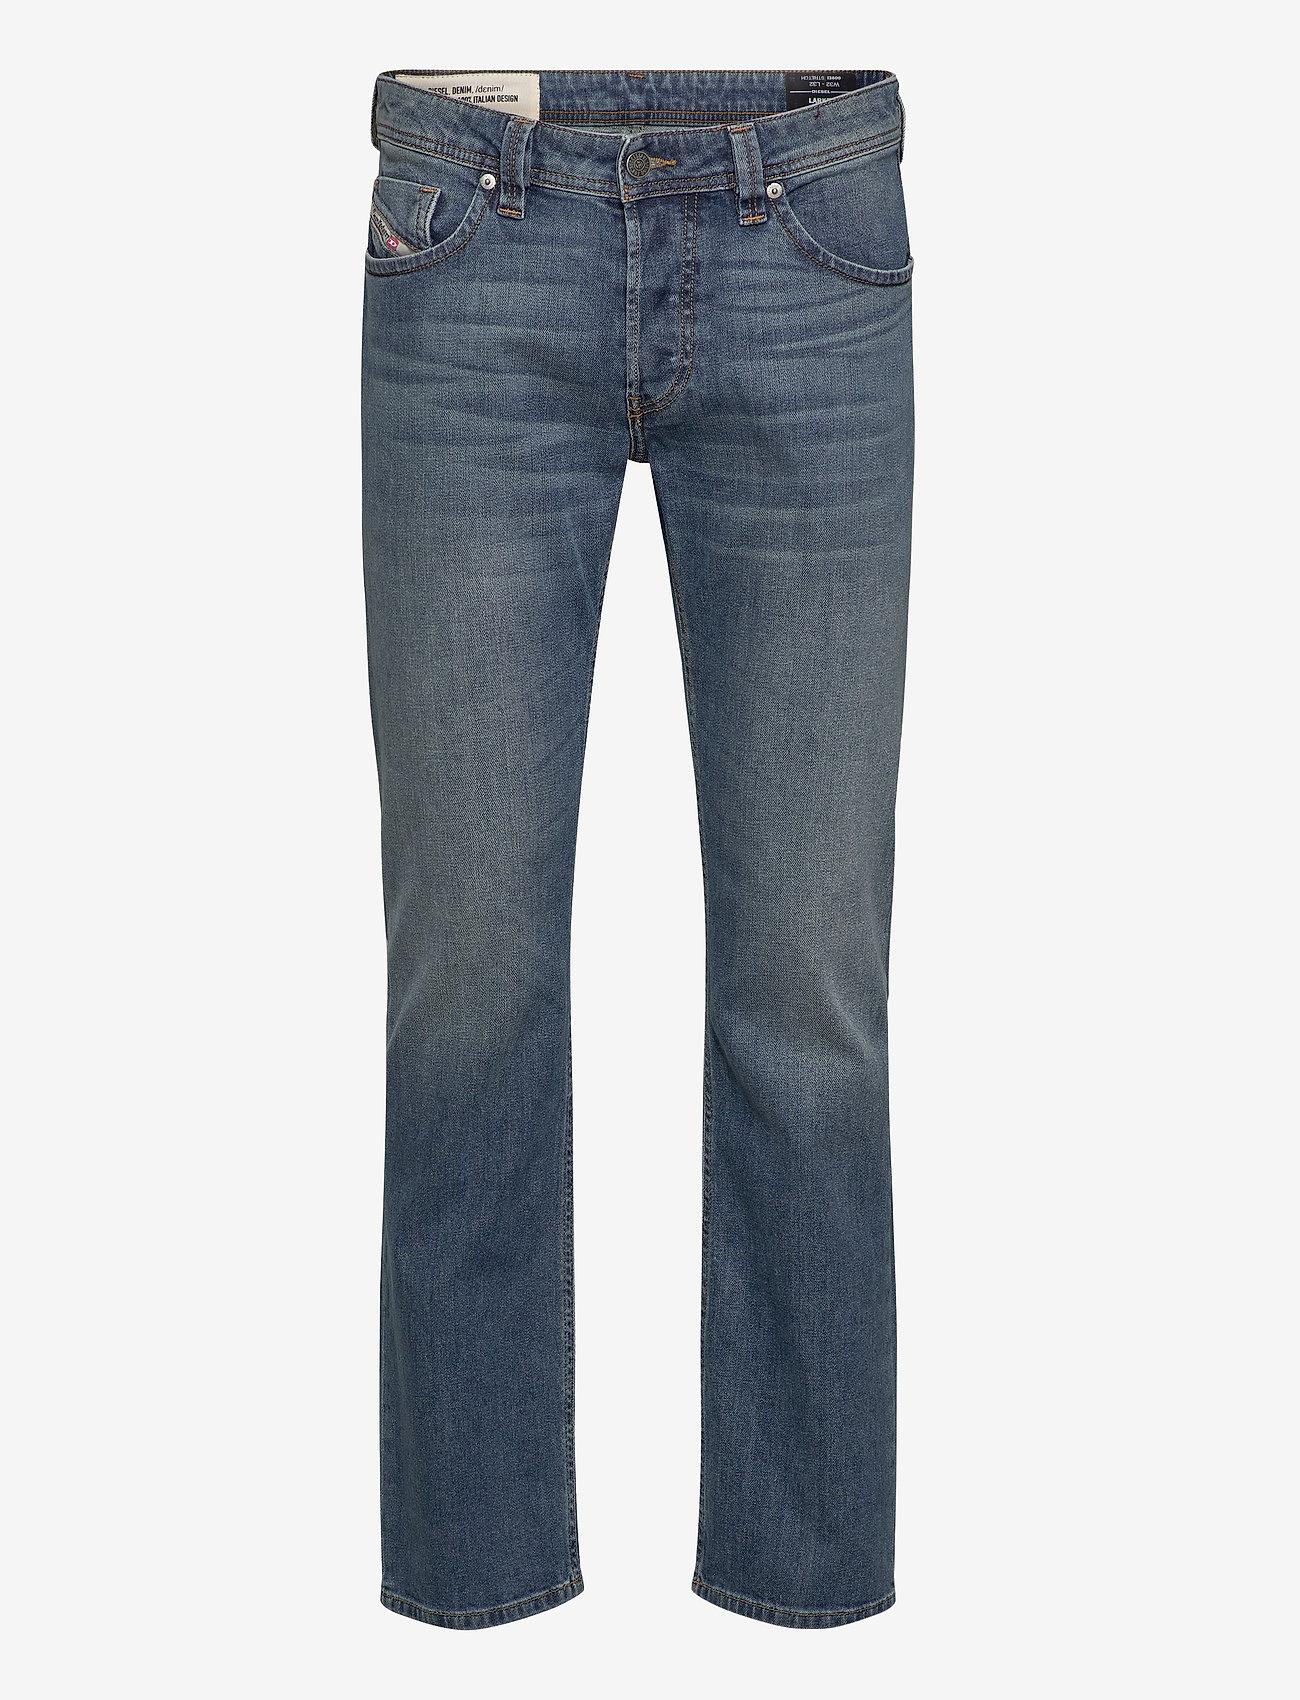 Diesel Men - LARKEE-X L.32 TROUSERS - regular jeans - denim - 0